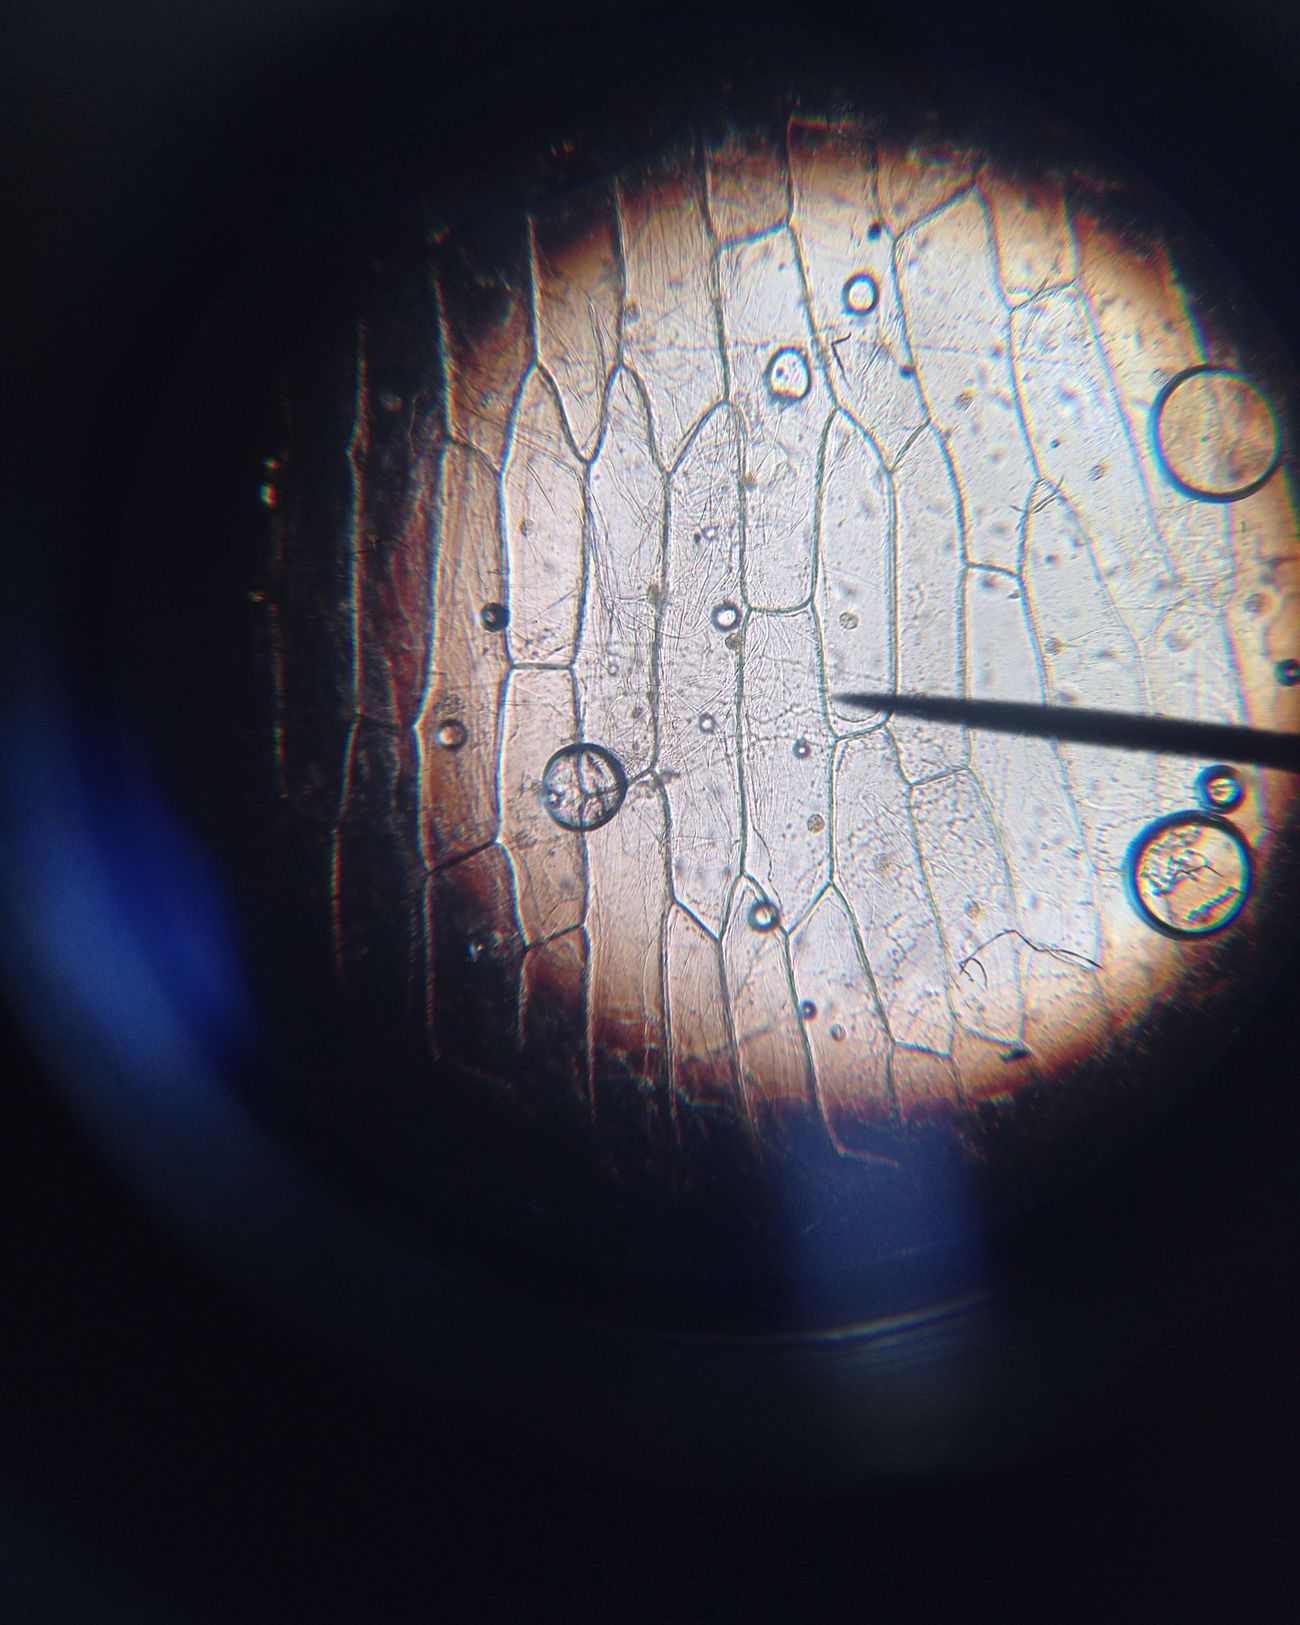 Microscopes always Fascinate me